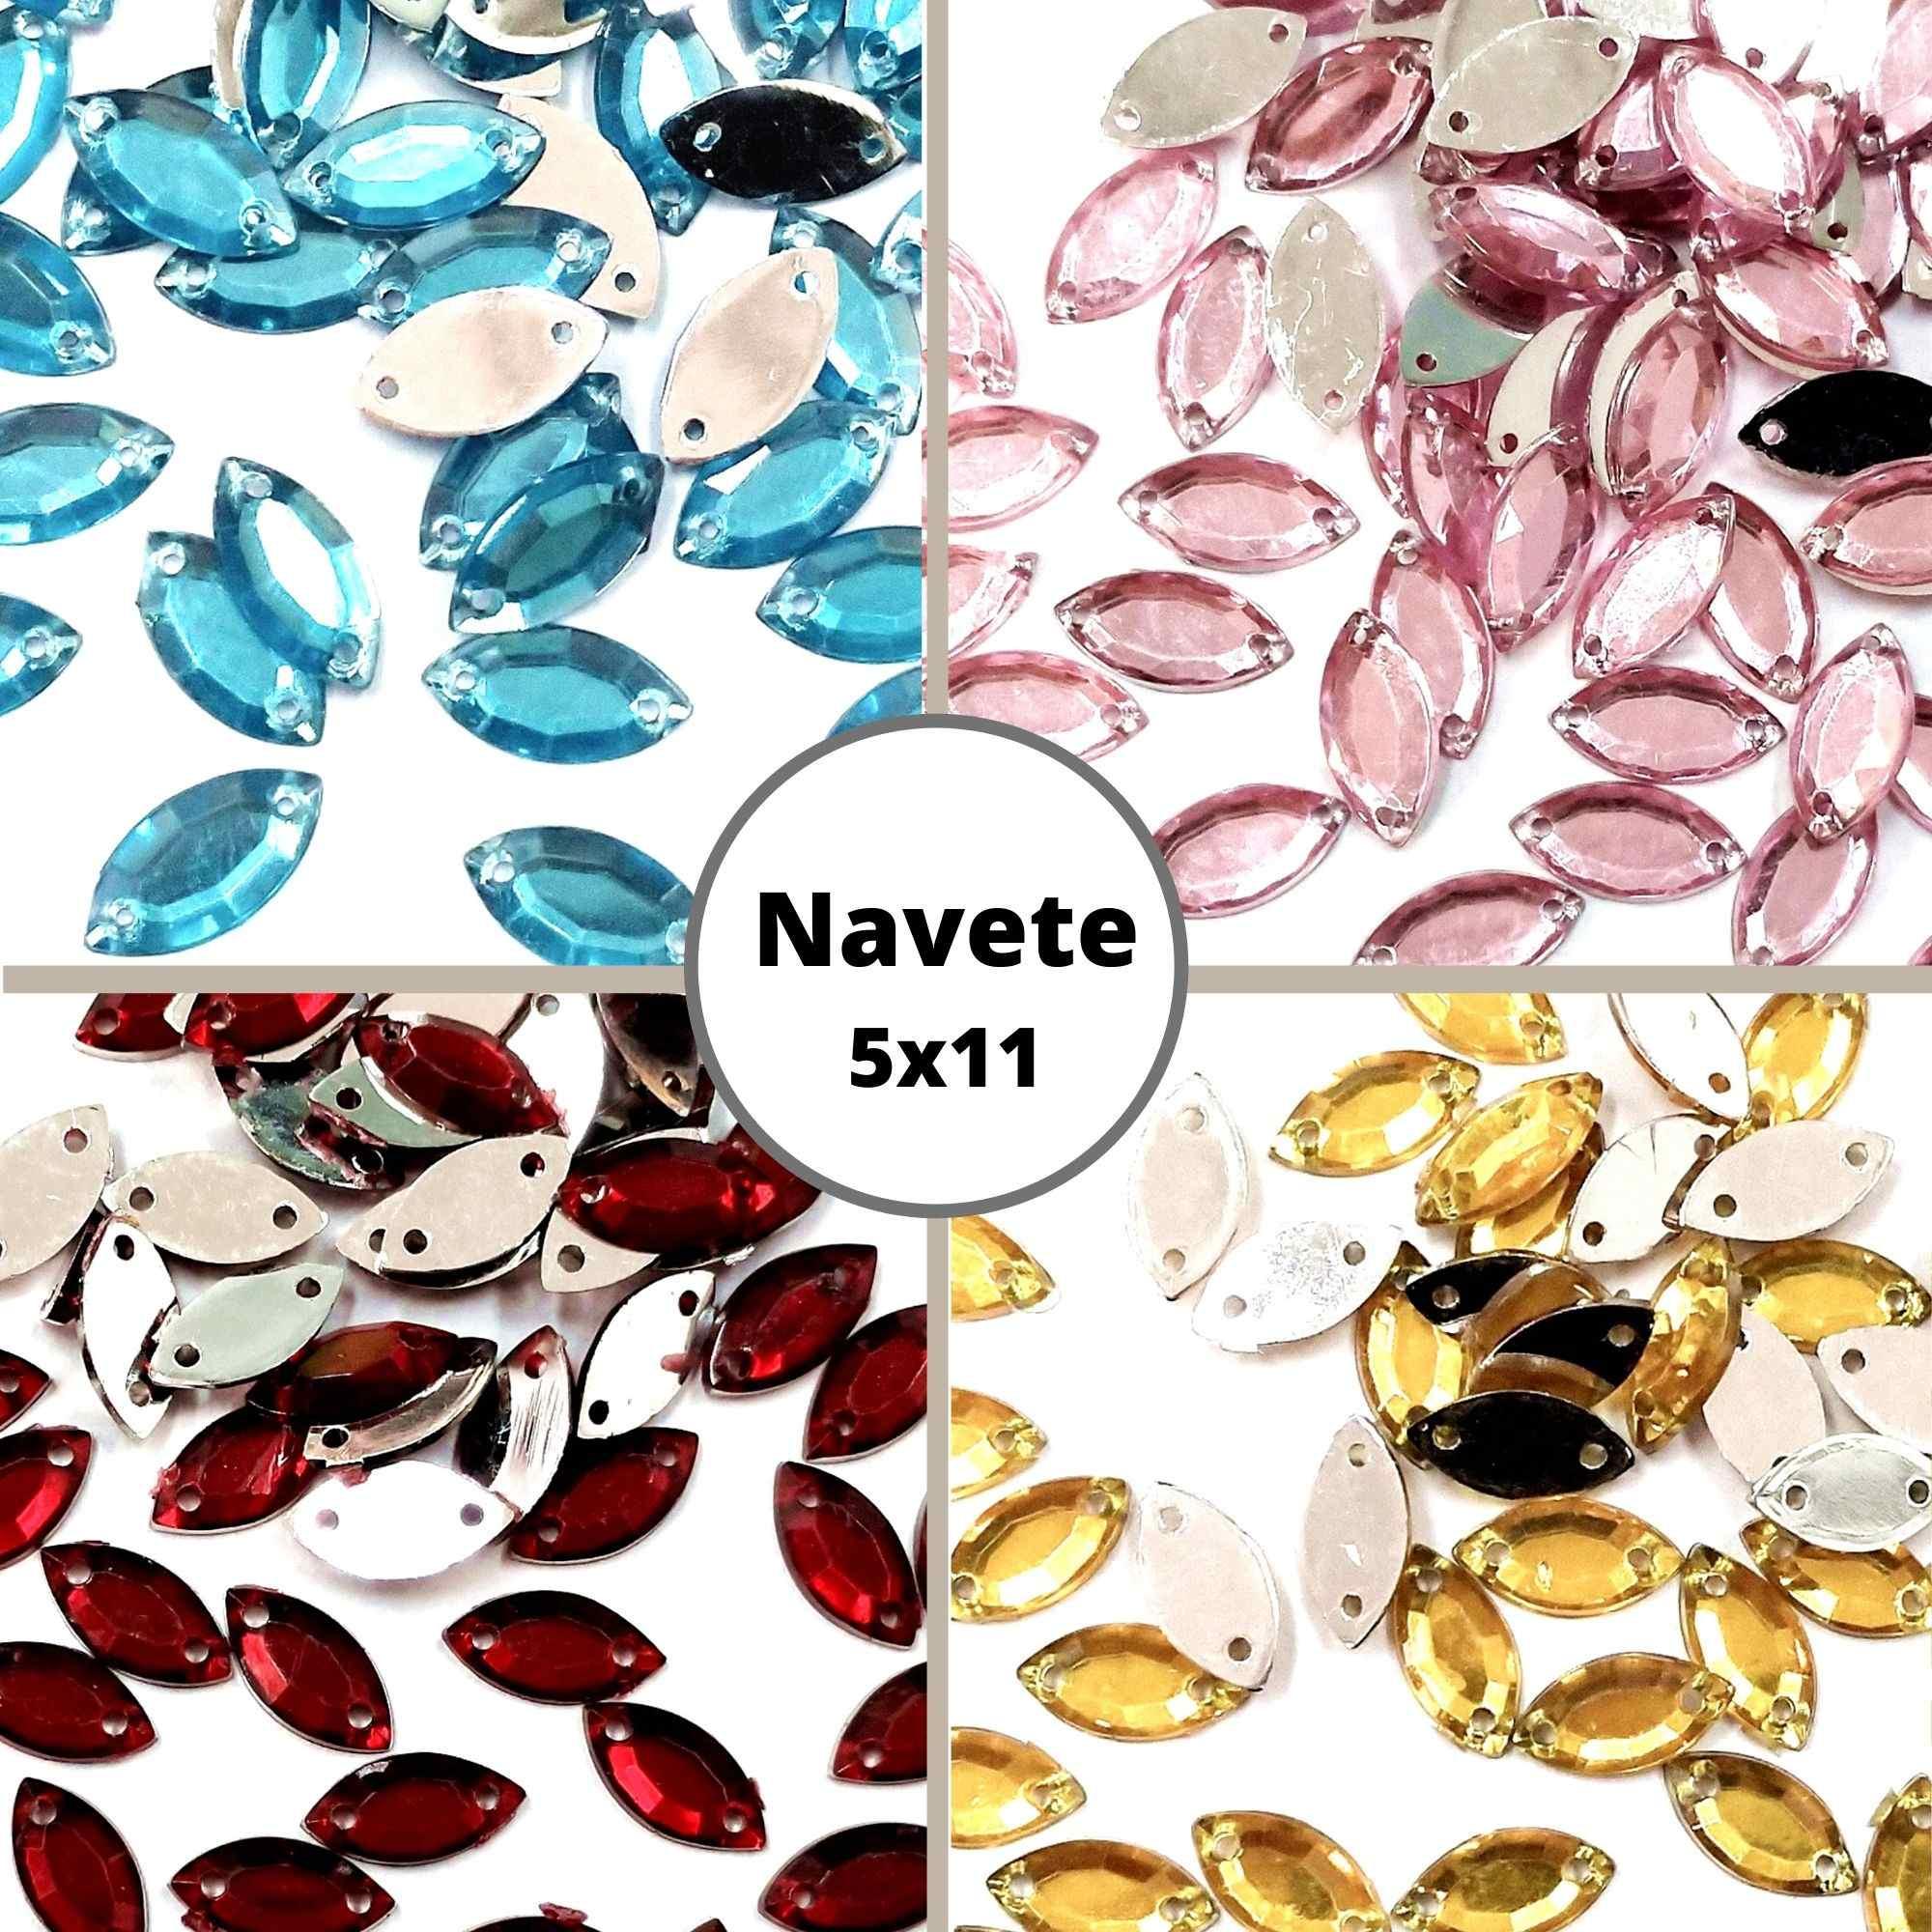 Chaton Navete 5x11 - Pacote com 200 unidades